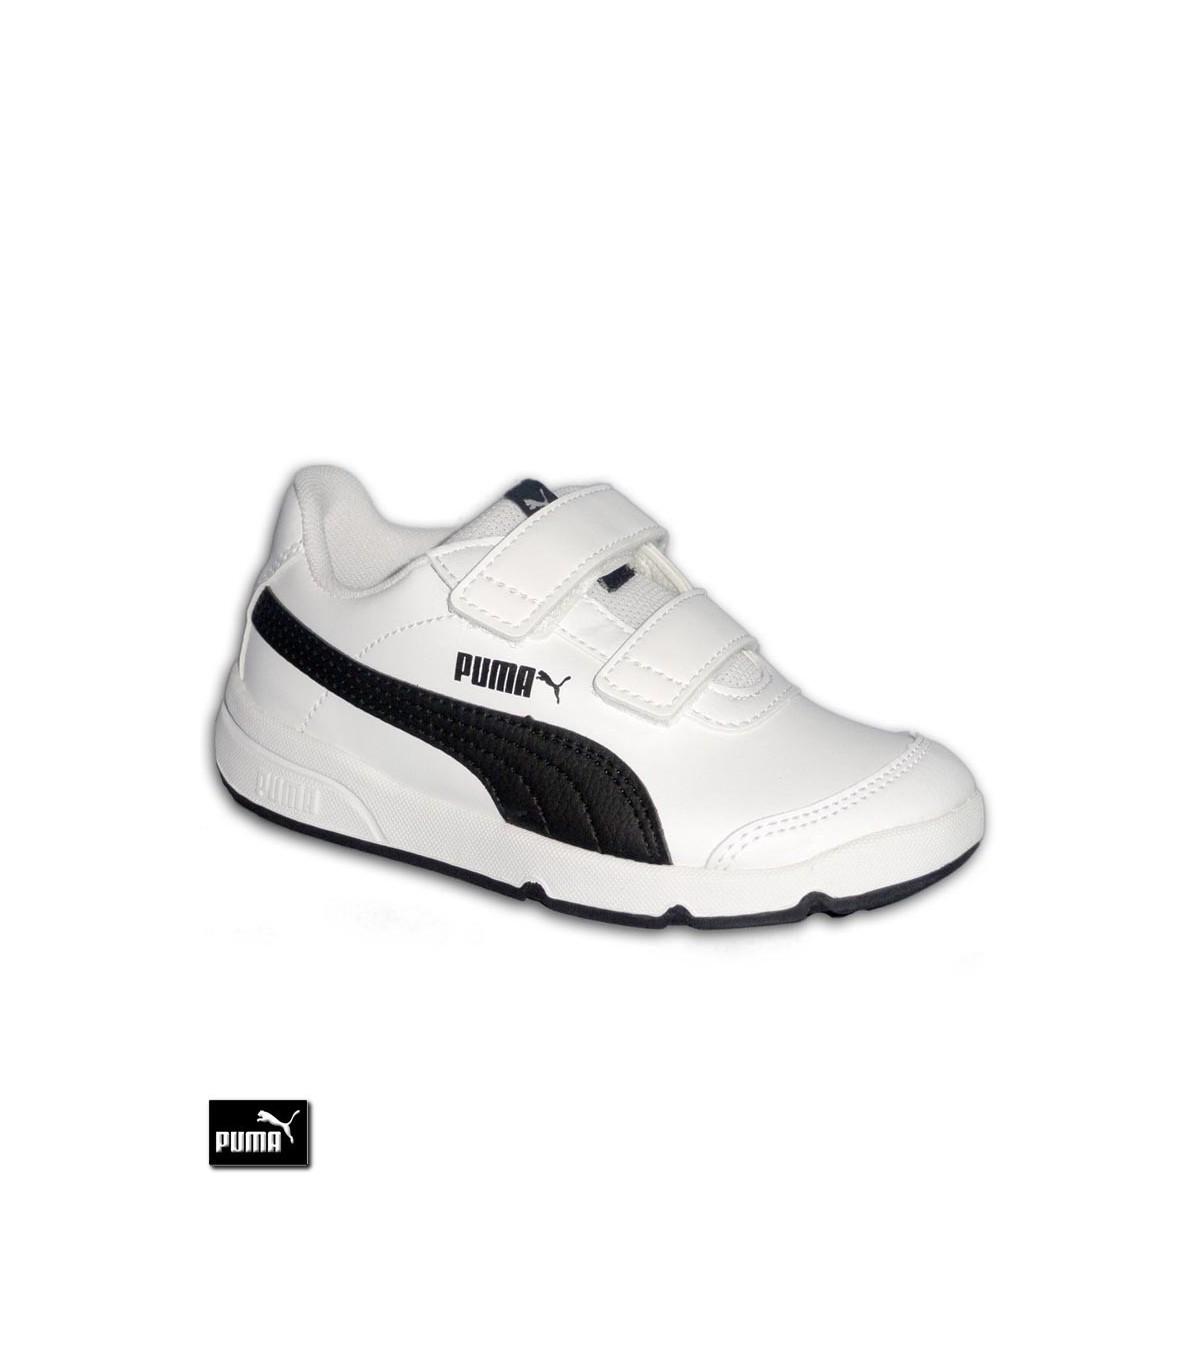 d3884ce1d61 ... Zapatilla Deporte Niños PUMA STEPFLEEX 2 SL V PS Velcro Blanco-Negro · Zapatilla  Deporte Ni